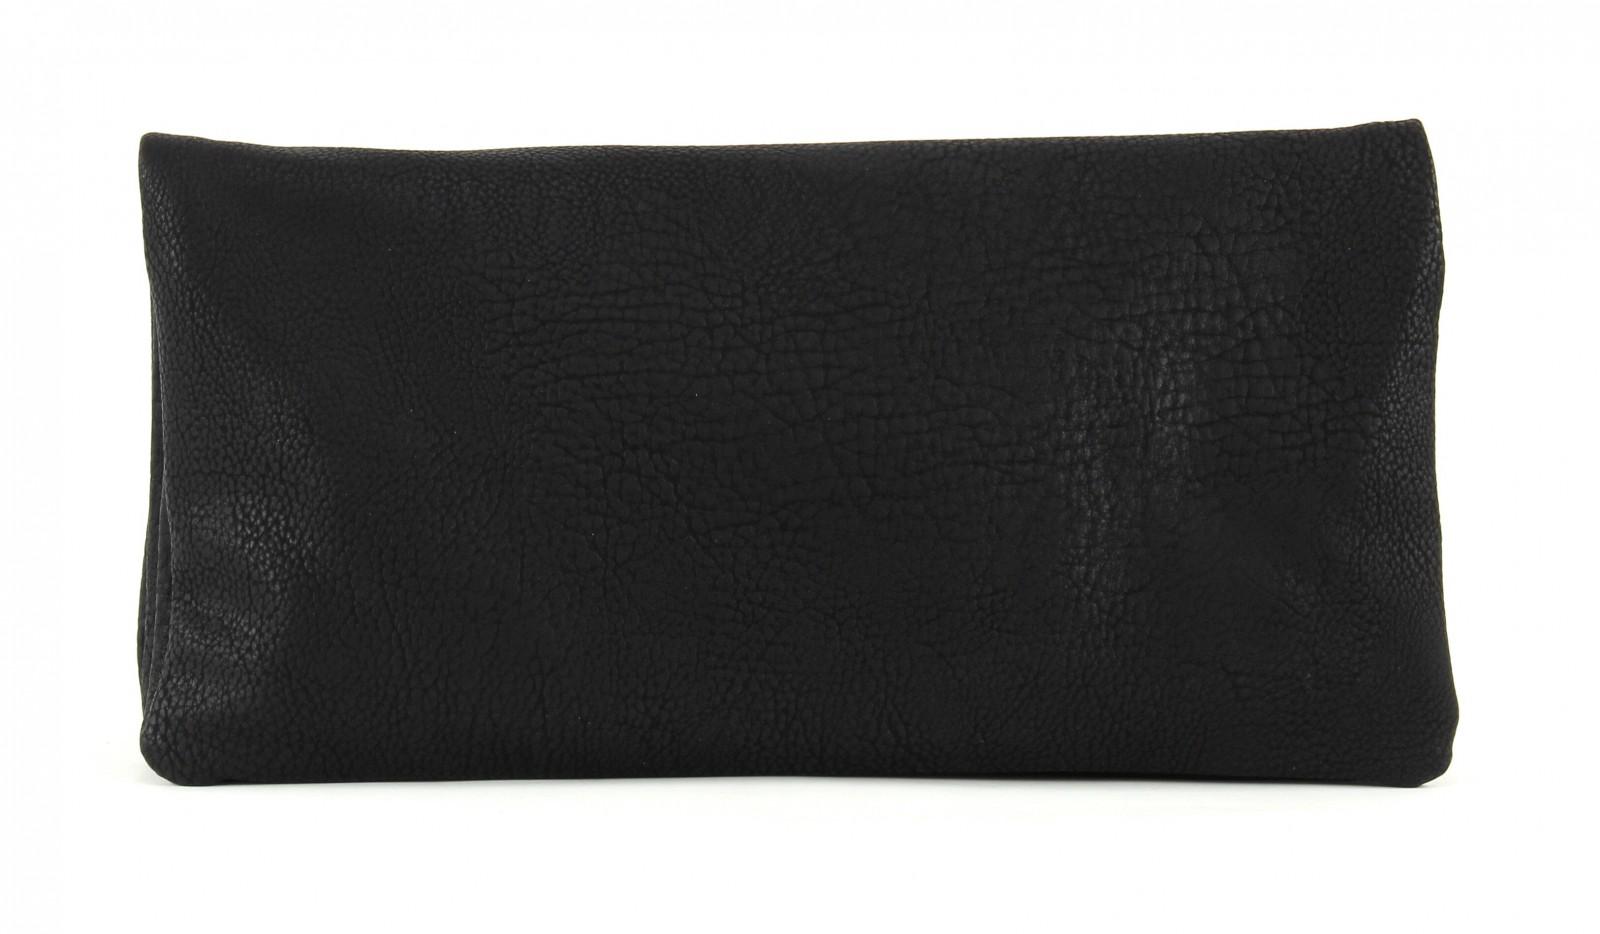 Fritzi aus Preußen Ronja Classic Berlin Tasche Handtasche Umhängetasche Schwarz